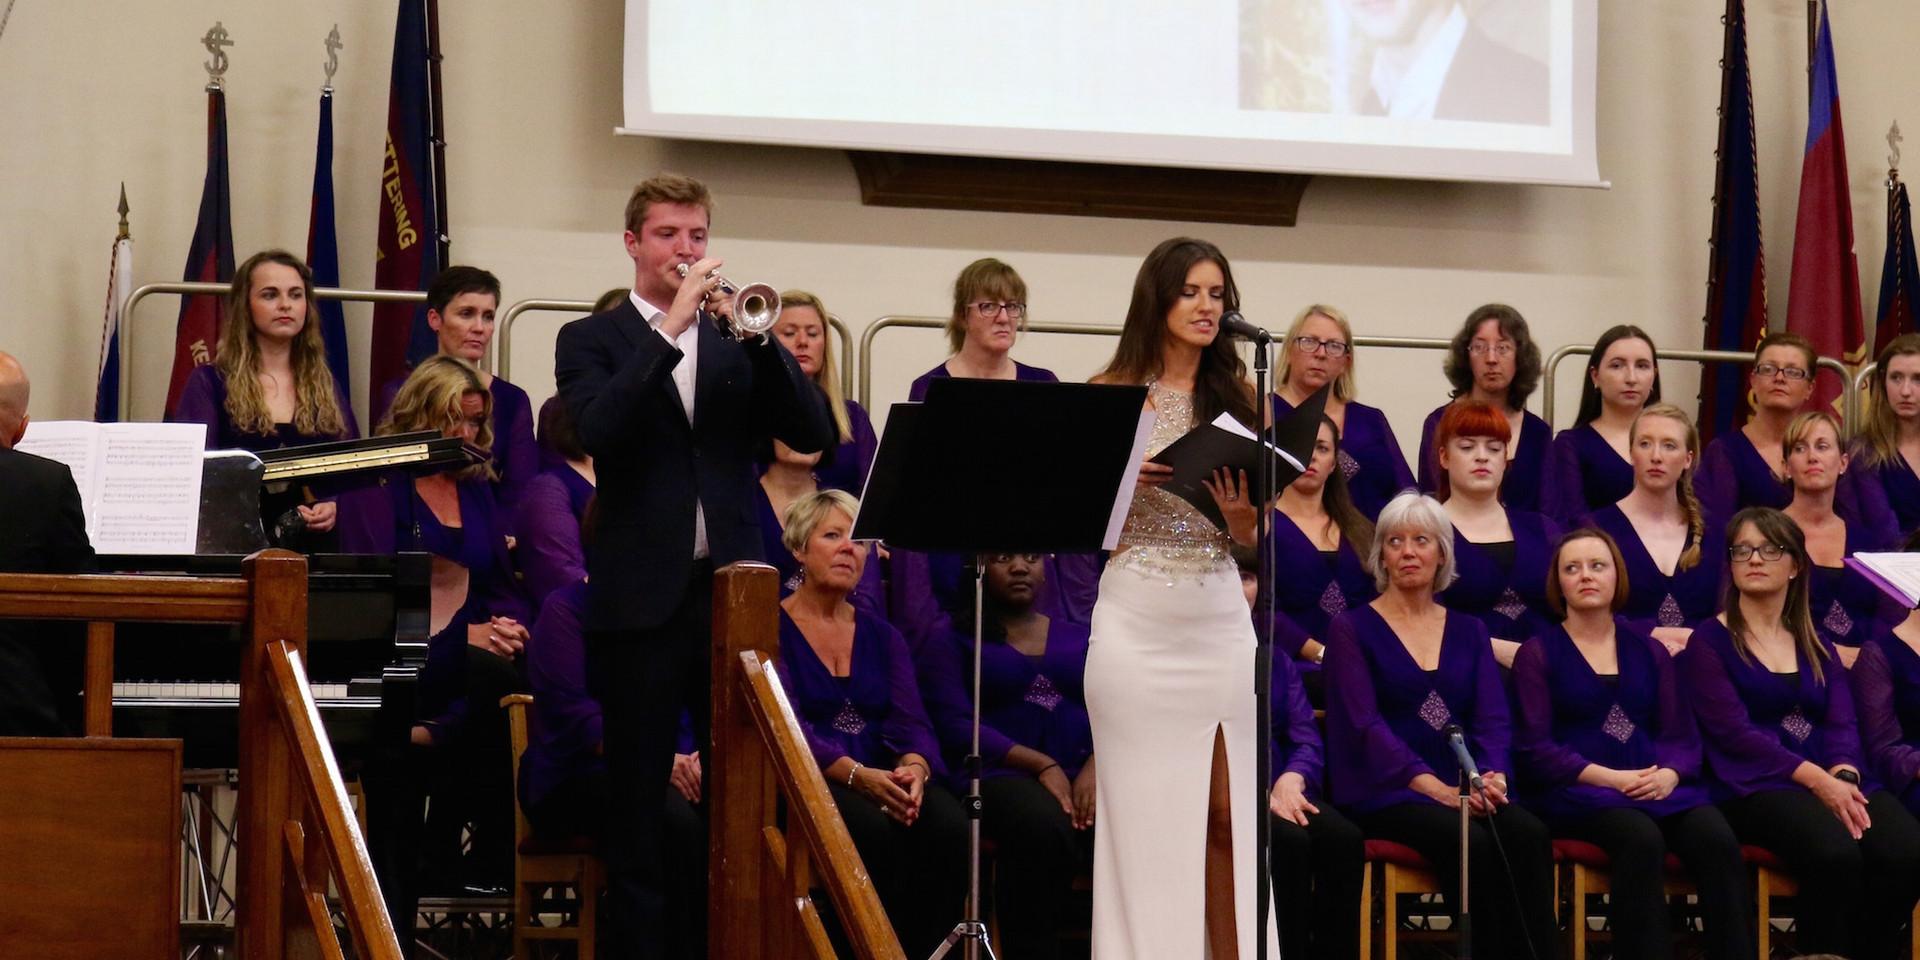 Cransley Charity Concert 2018 Thomas Fountain & Faryl Smith